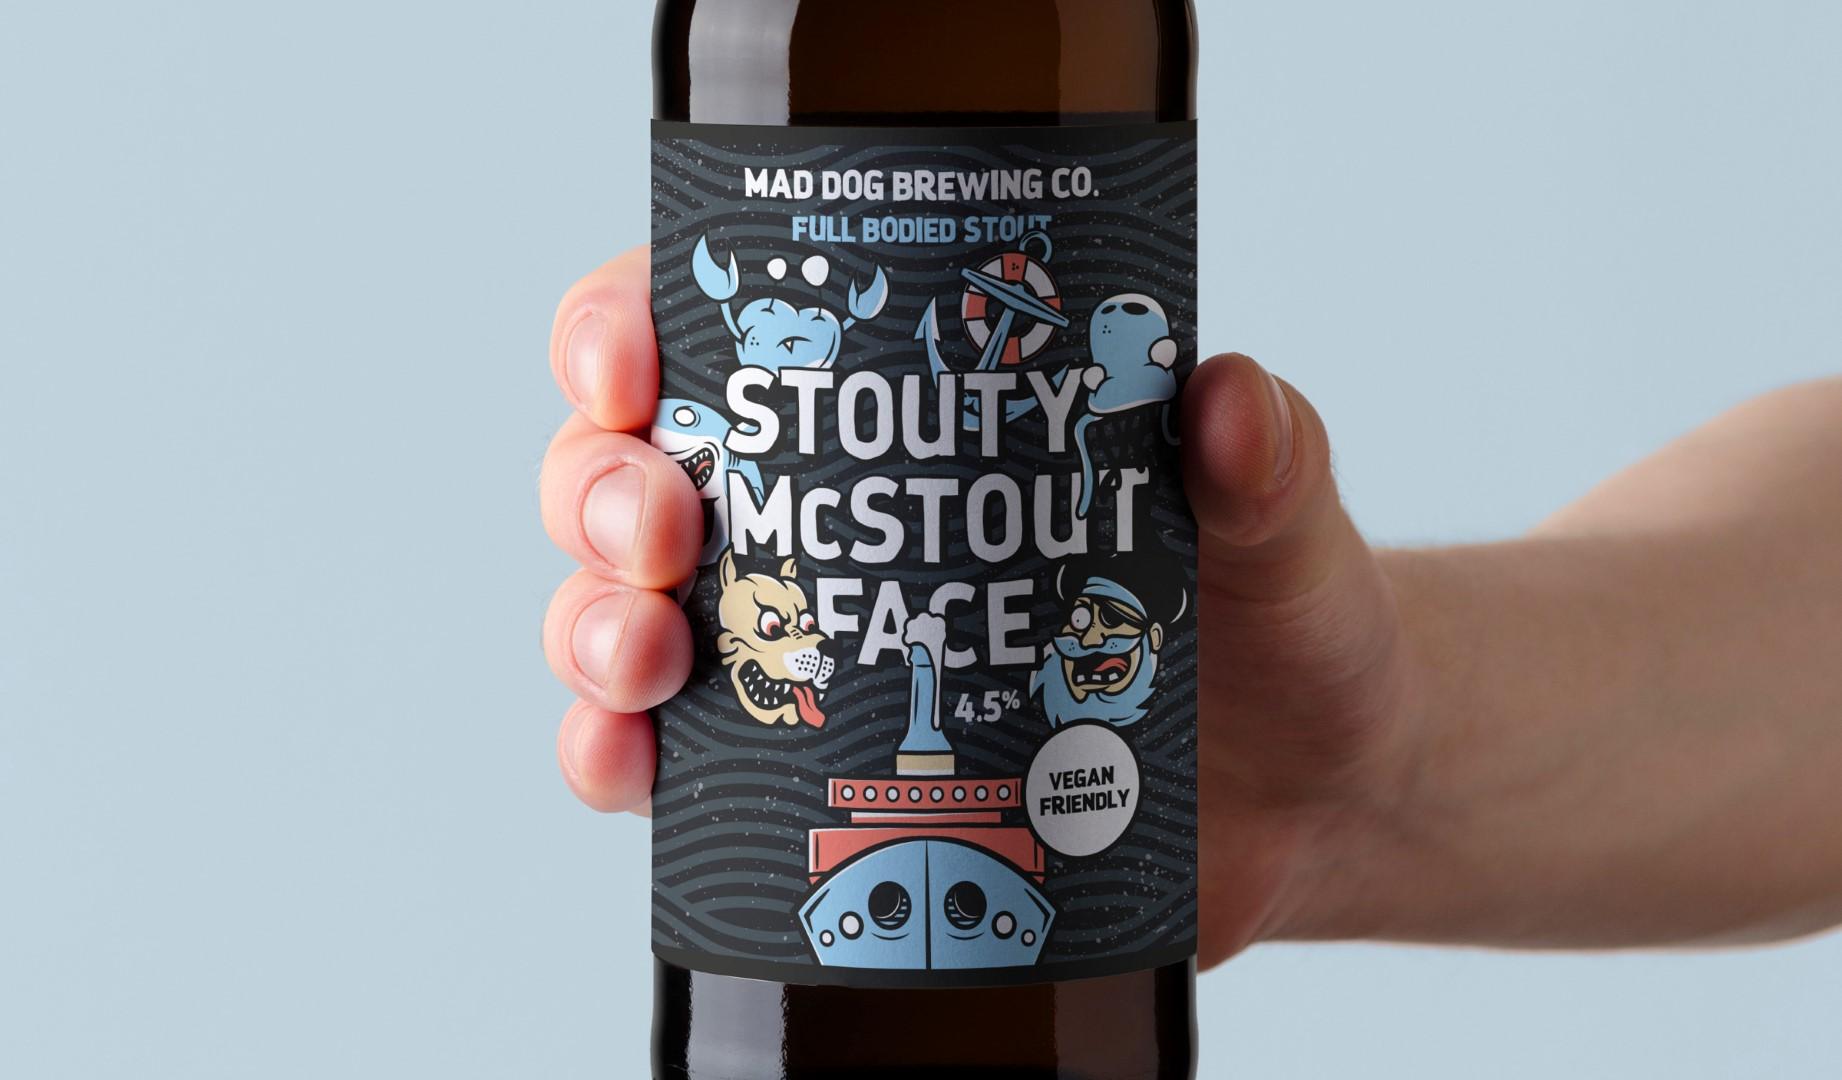 Arobase Creative – Mad Dog Brewing Co. Rebrand